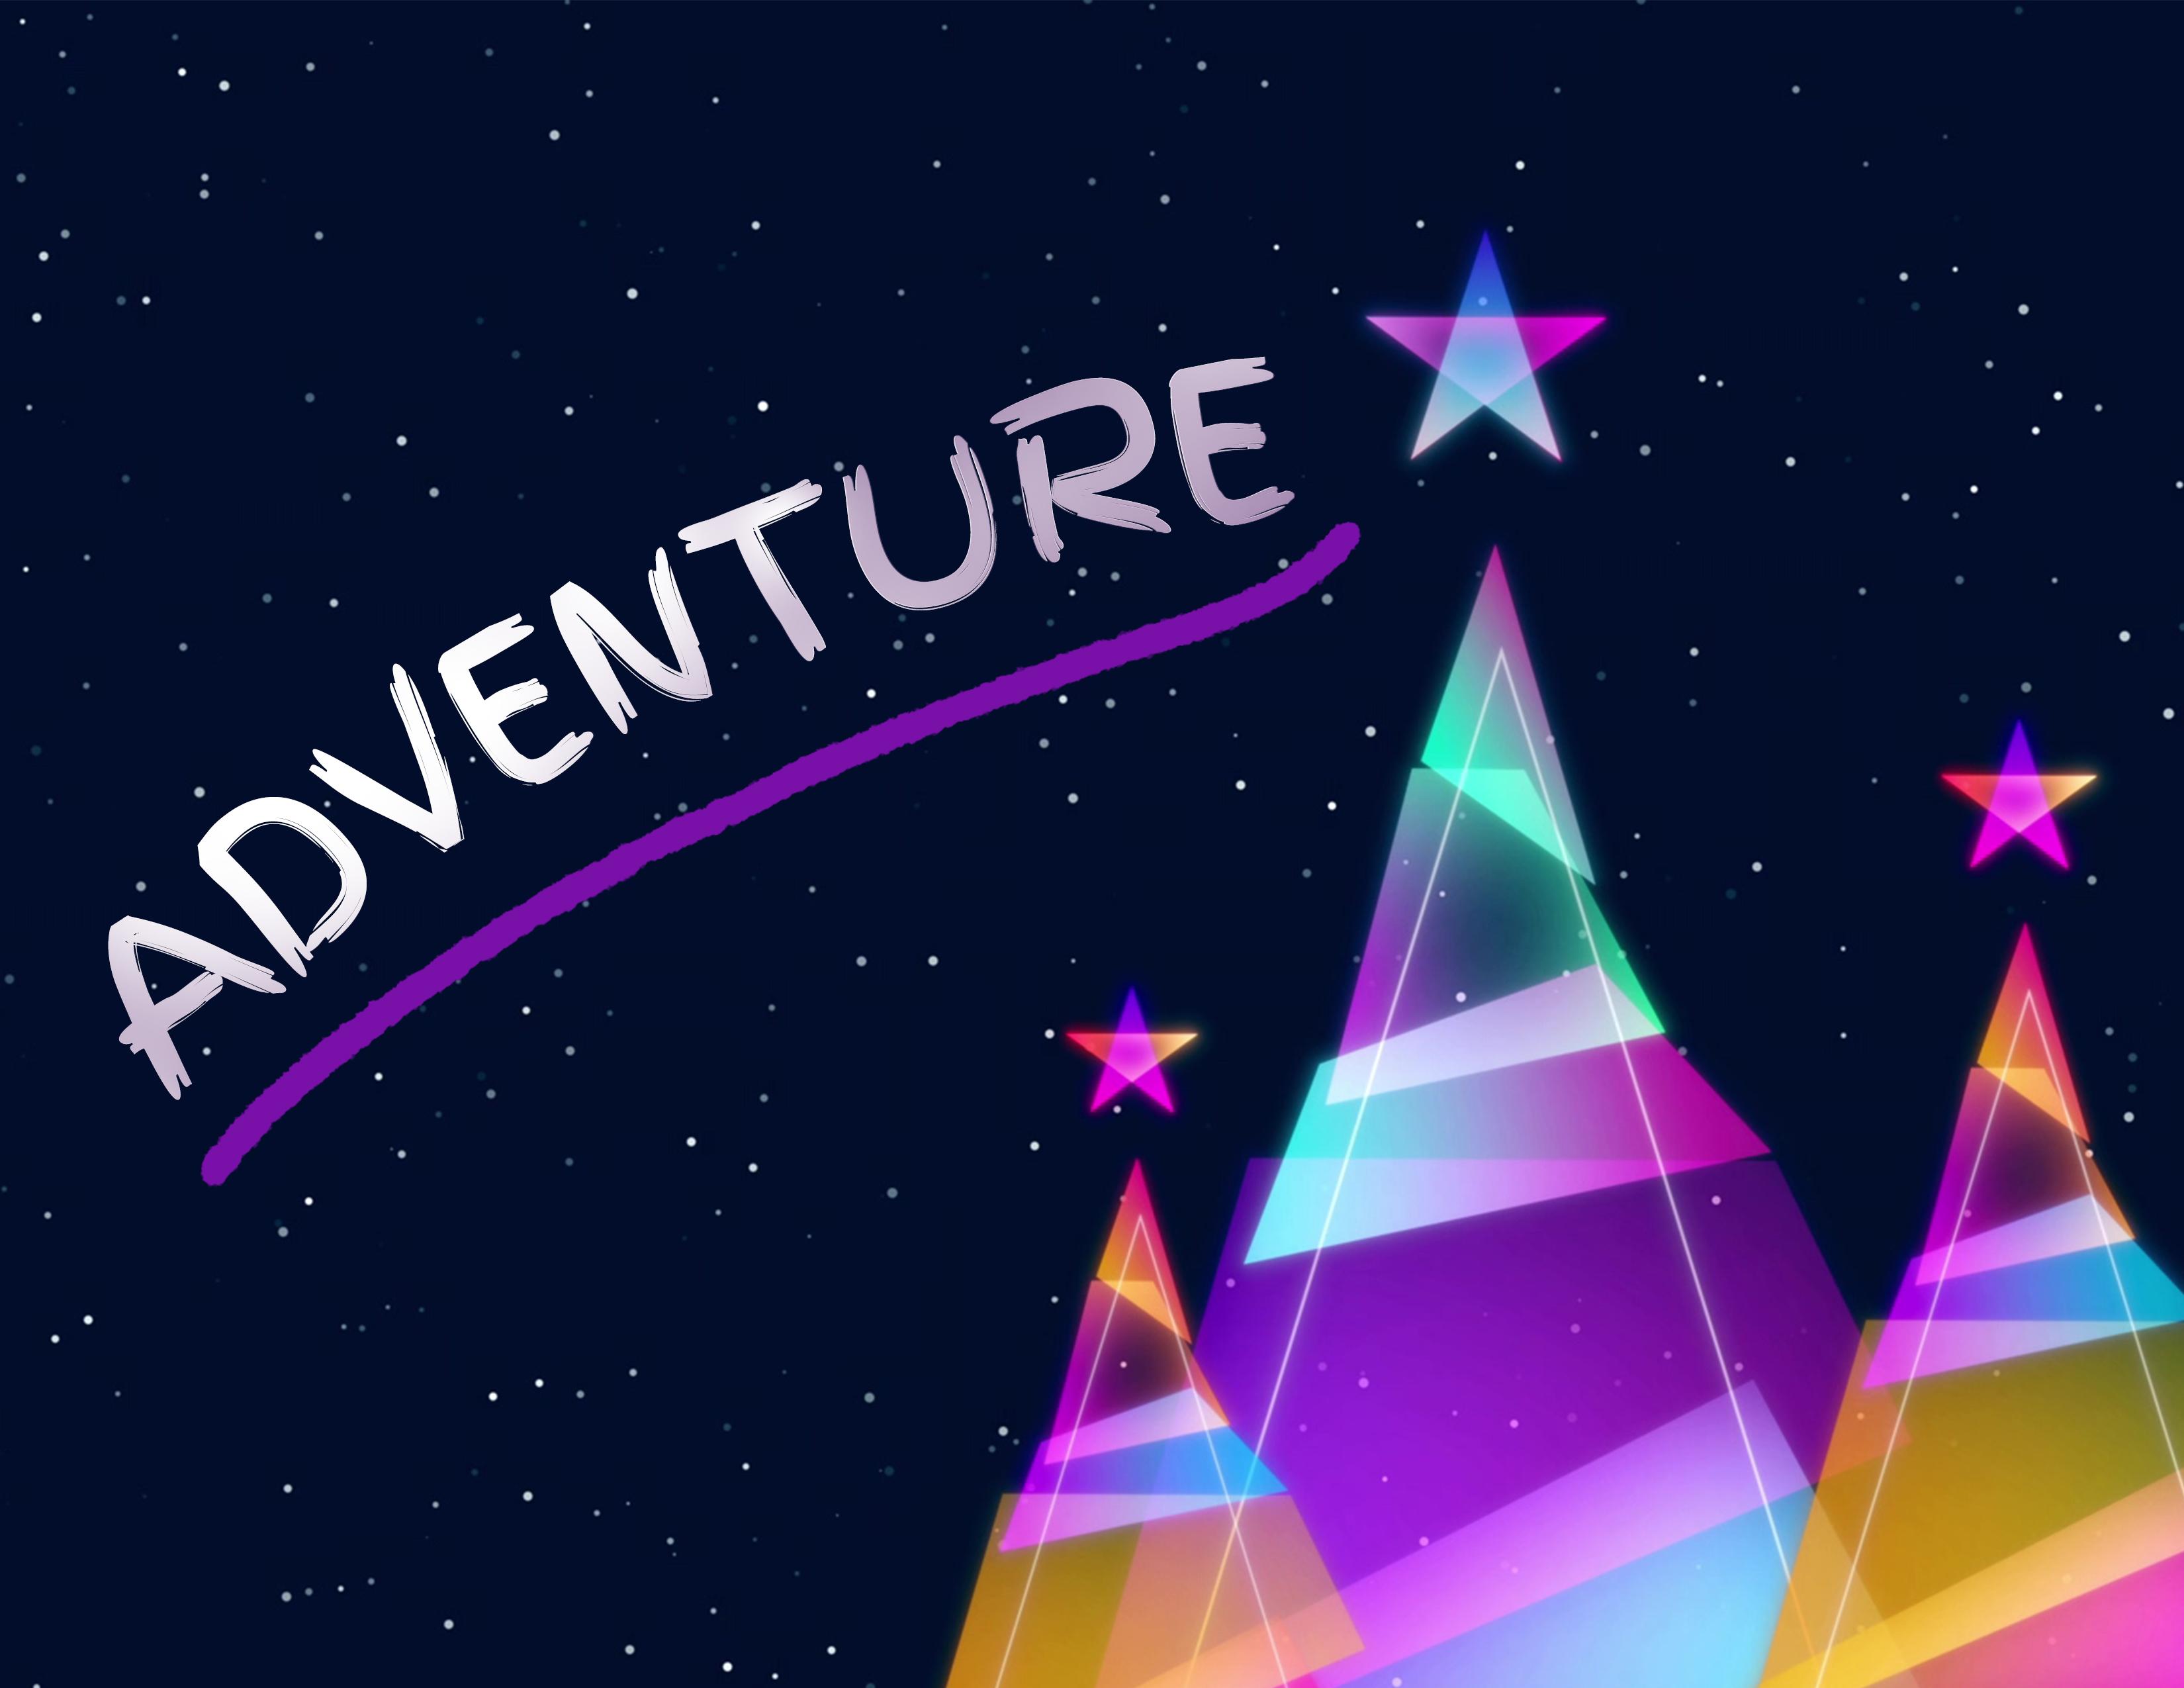 adventureprint.jpg